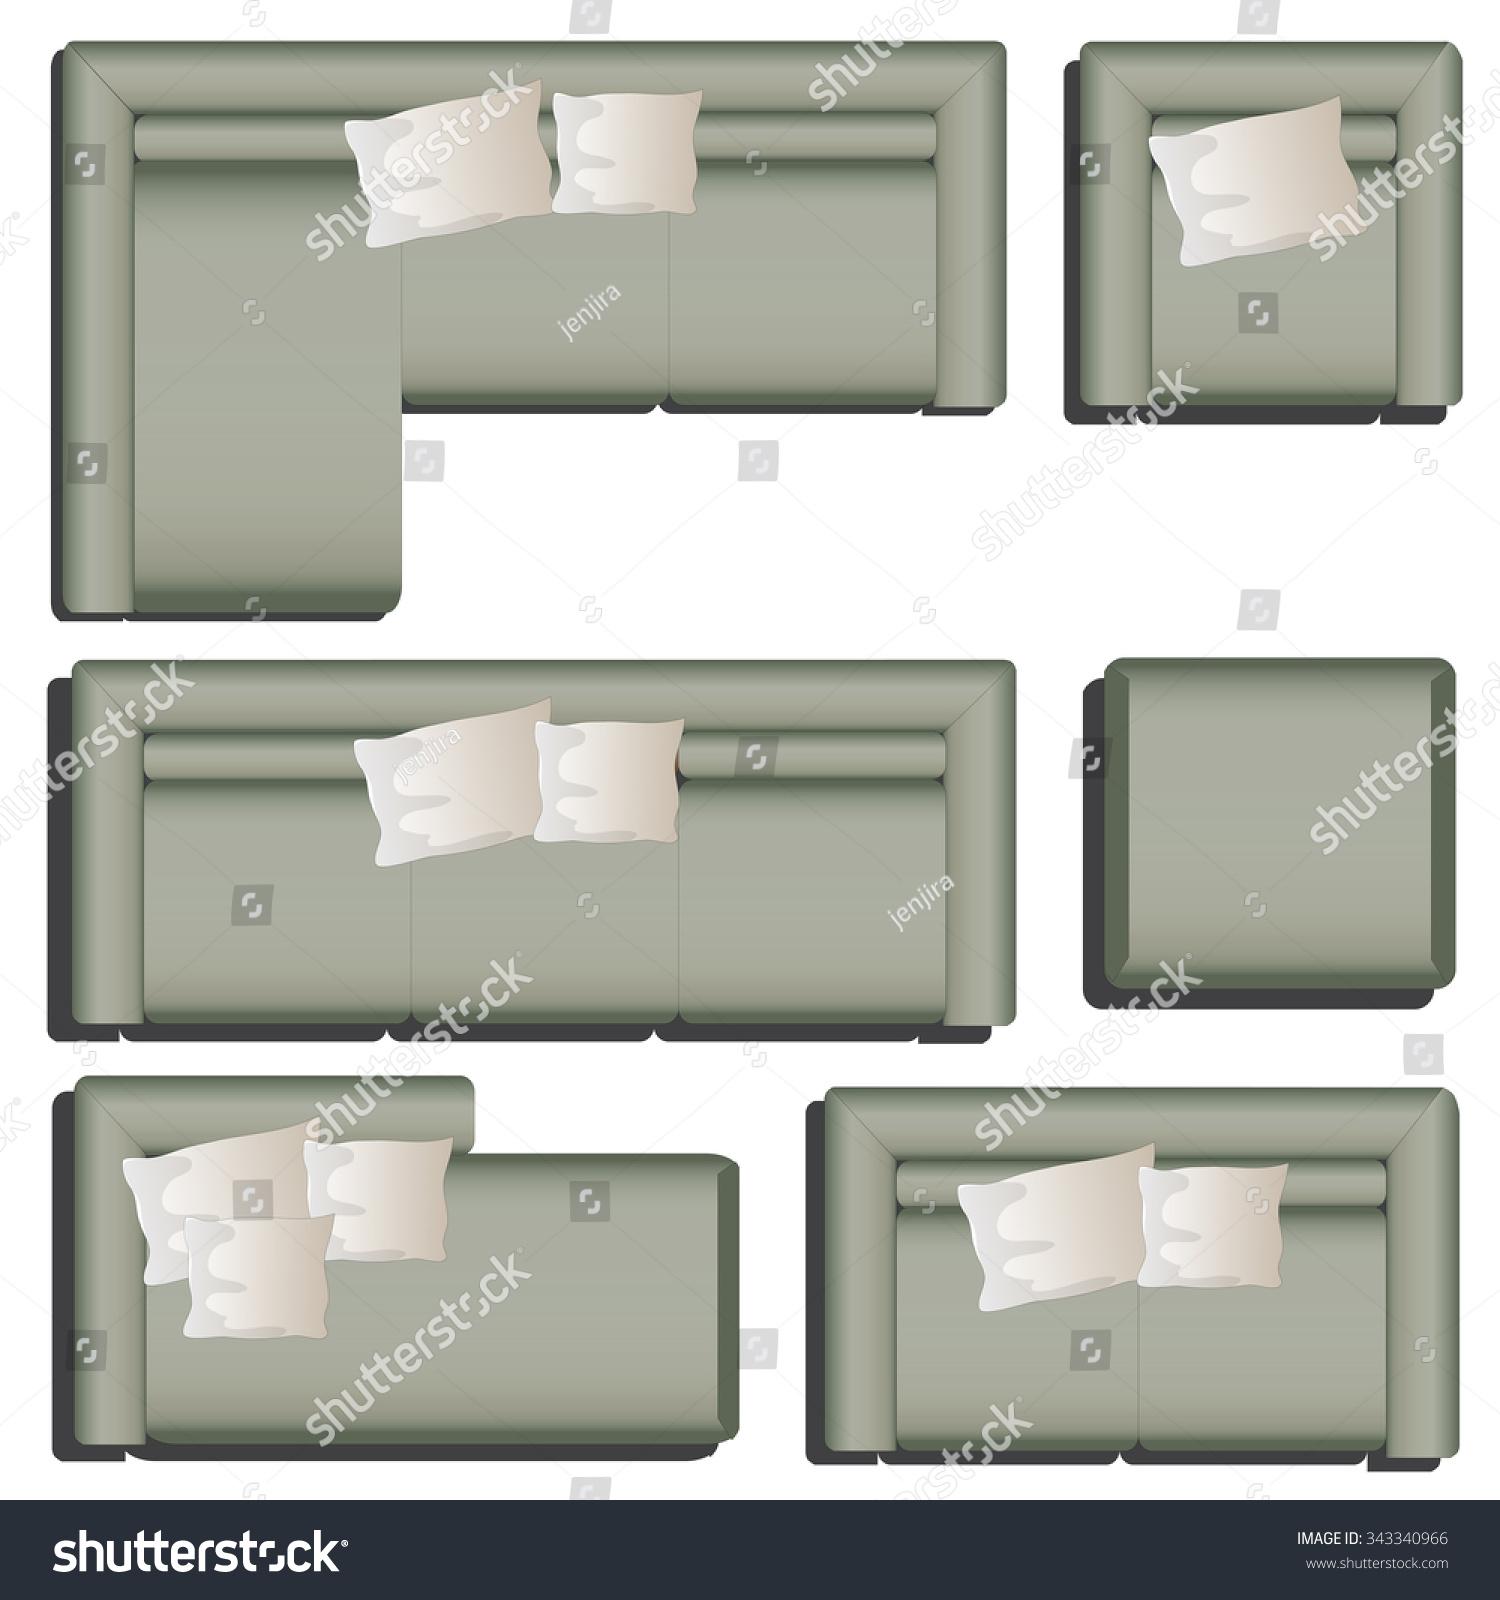 http://image.shutterstock.com/z/stock-vector-furniture-top-view-set-for-interior-black-sofa-343340966.jpg